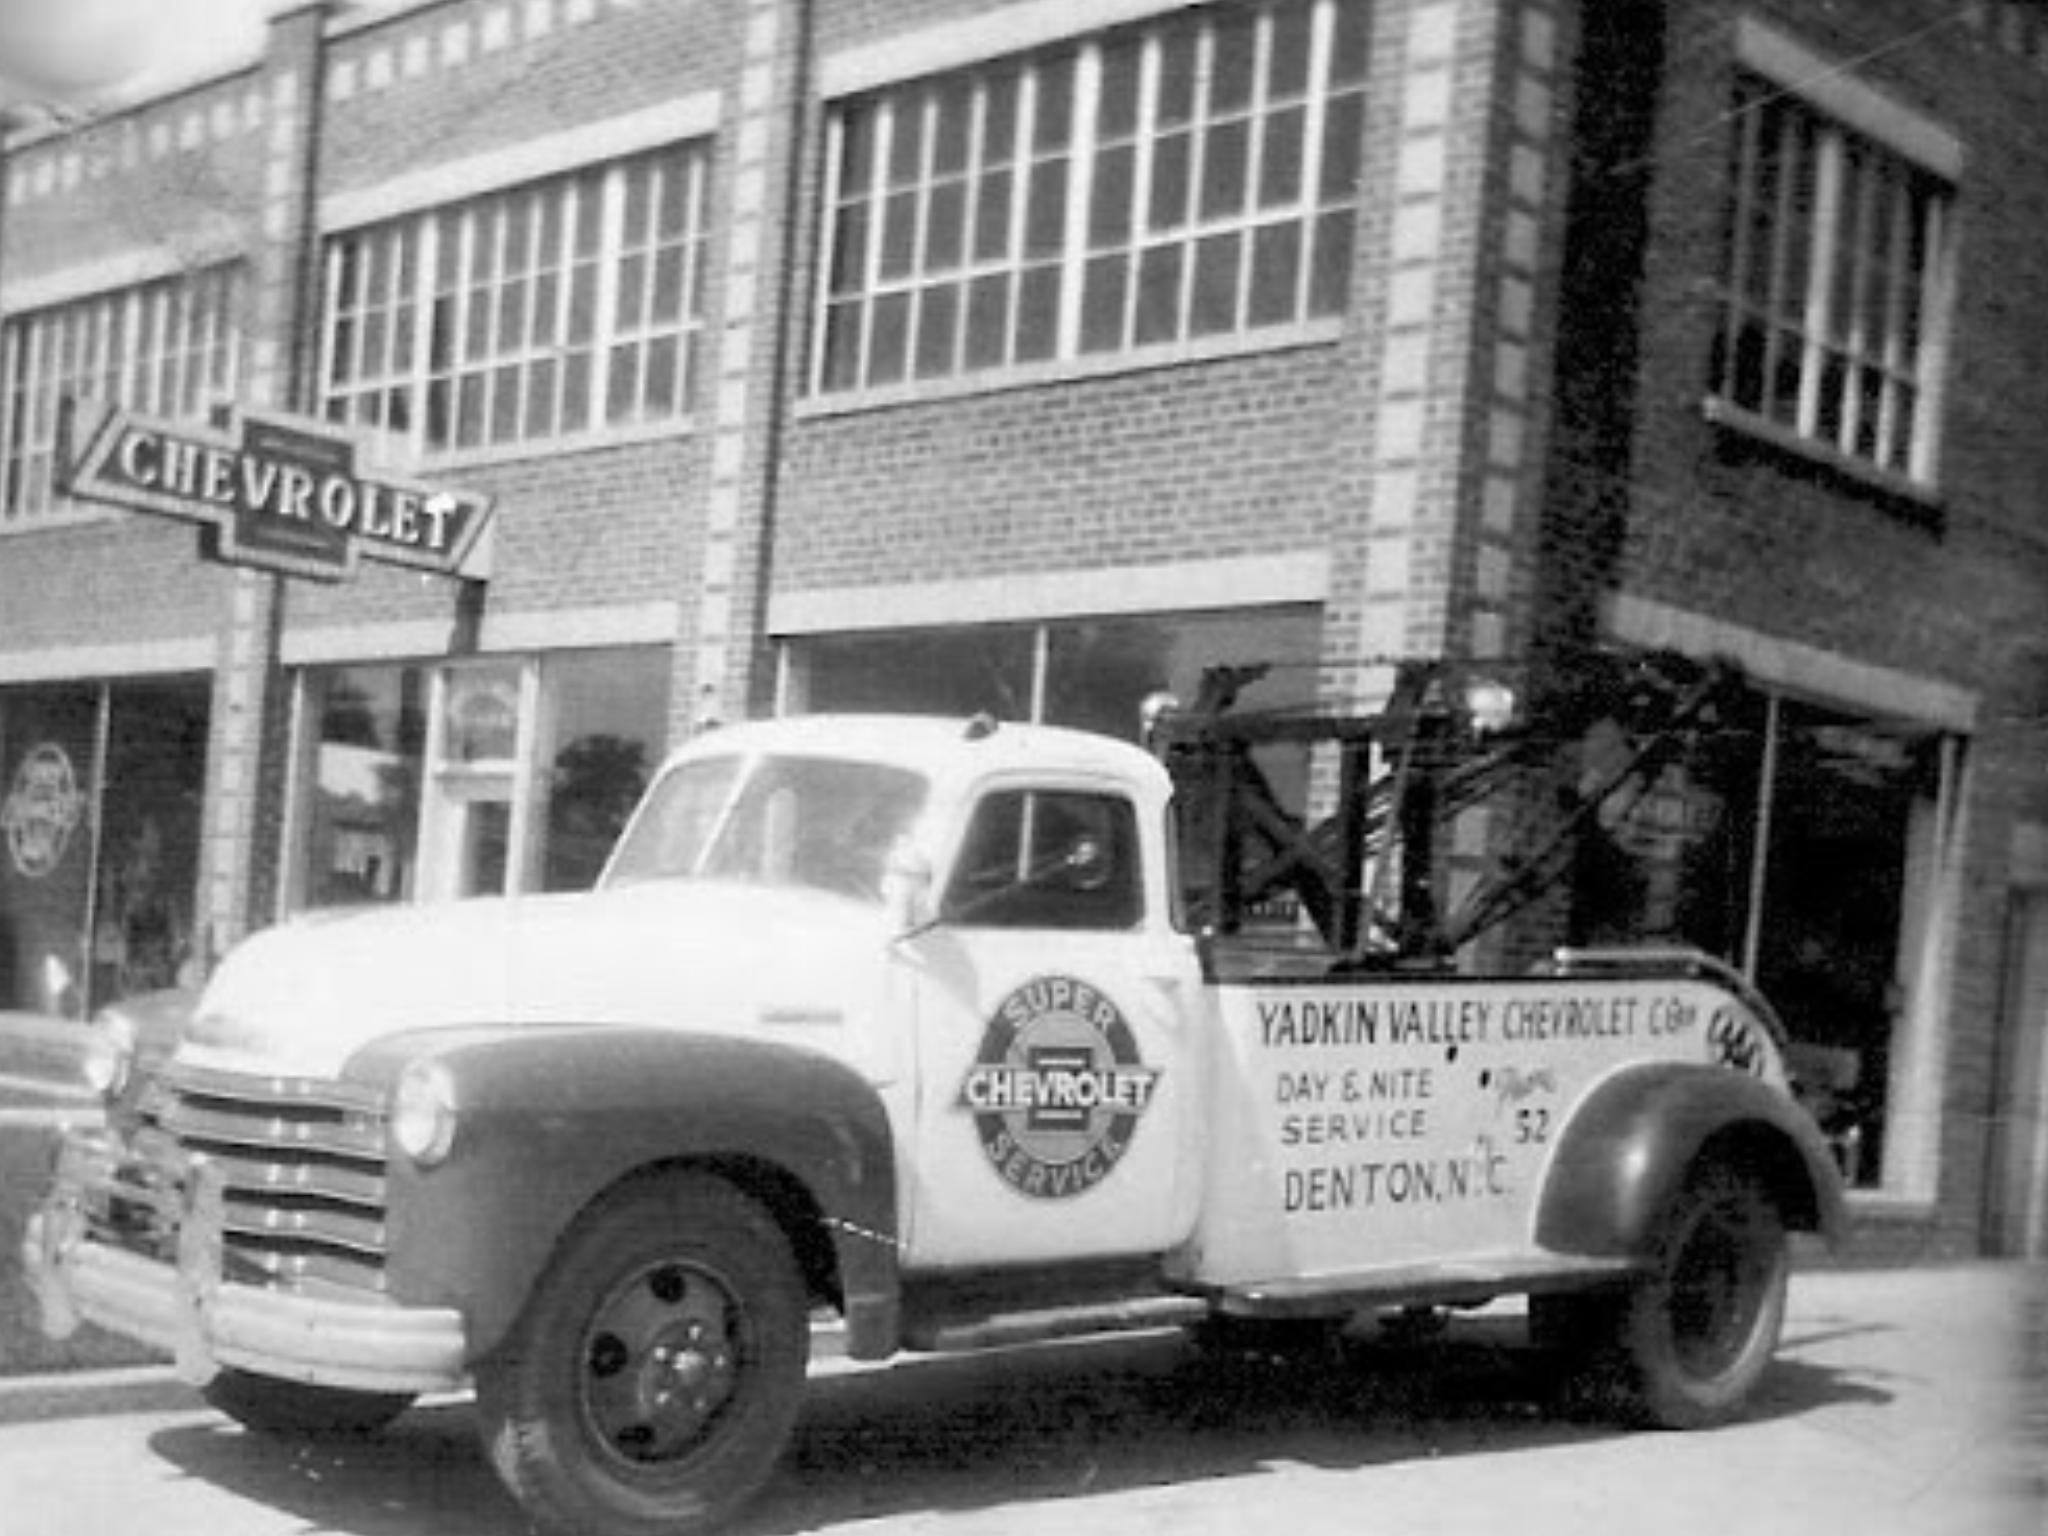 Yadkin Valley Chevrolet Co Dealership Denton North Carolina